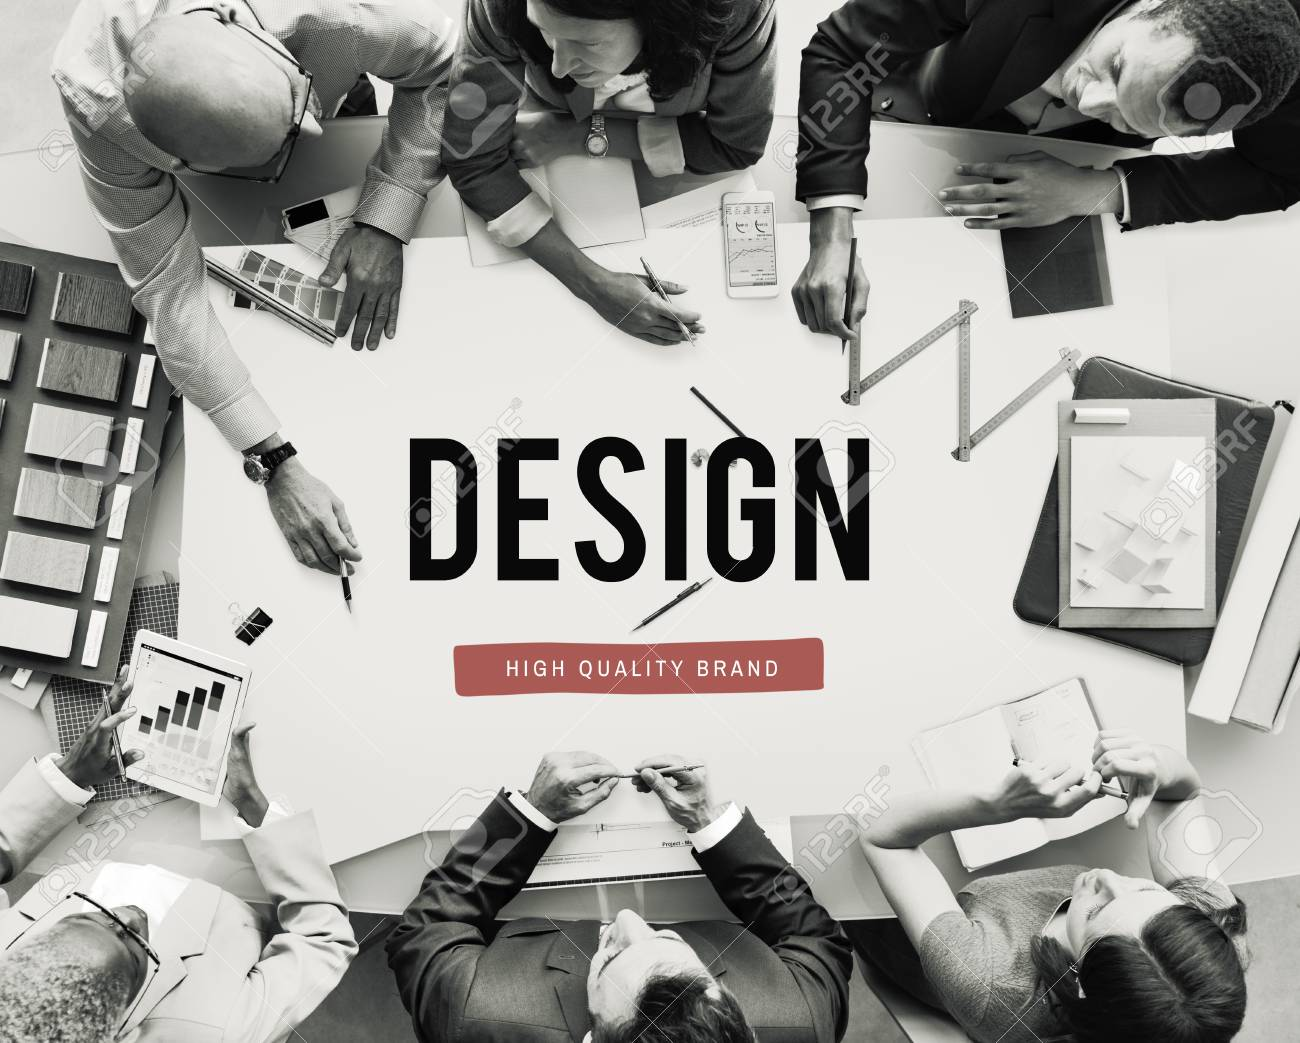 Ideas Design Creativity Thinking Project Concept - 59265490